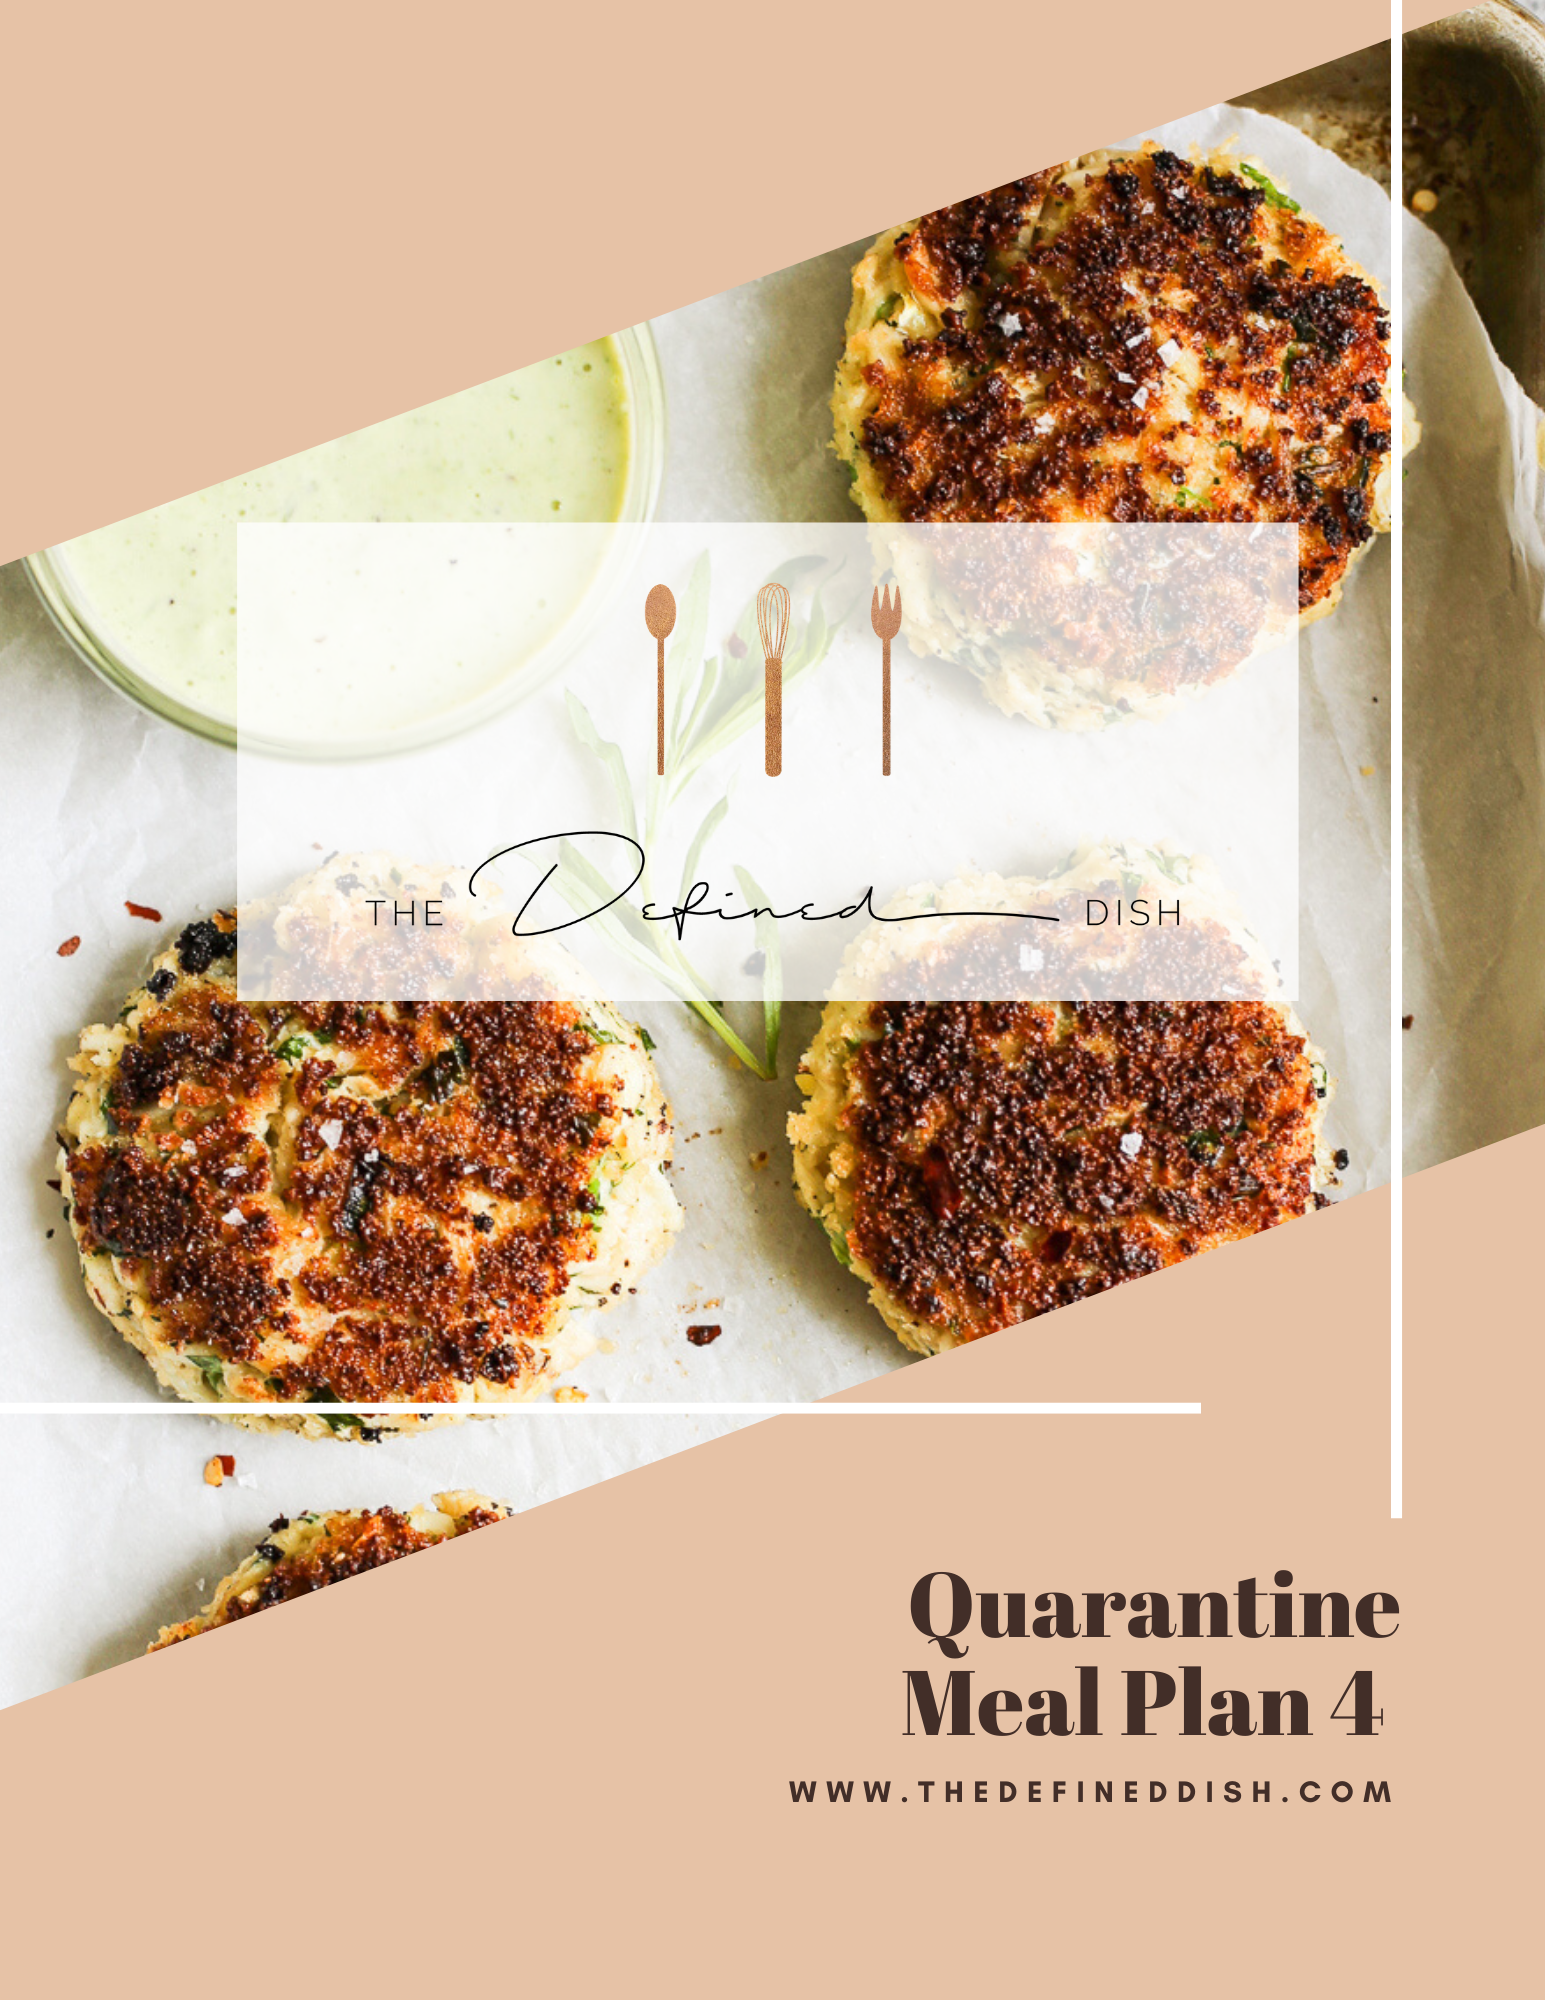 Quarantine Meal Plan 4